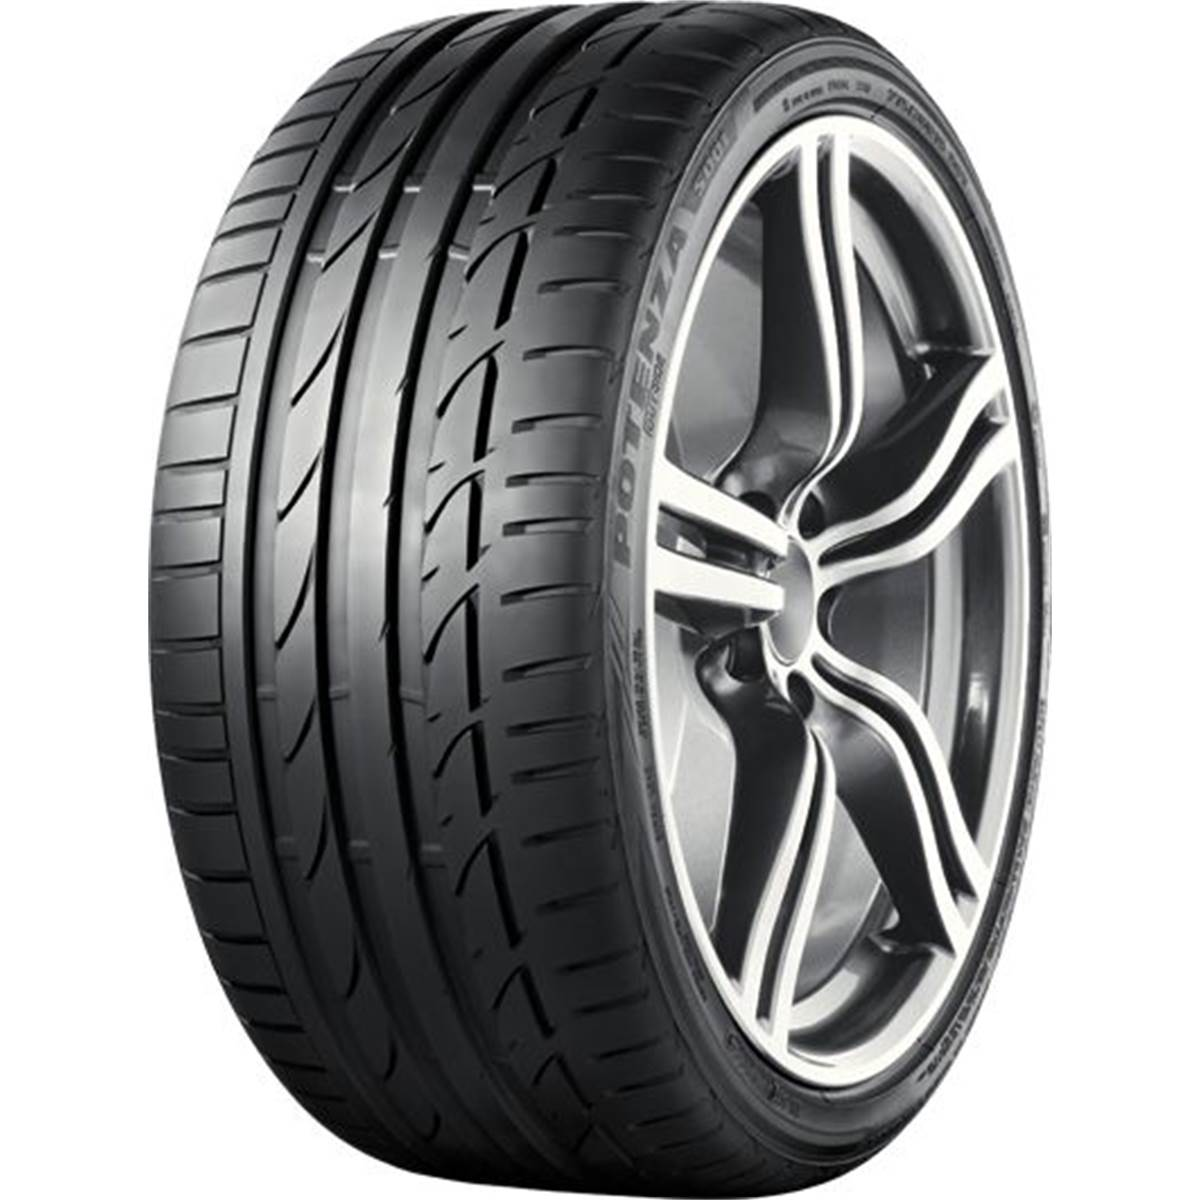 Pneu Bridgestone 245/45R17 95W Potenza S001